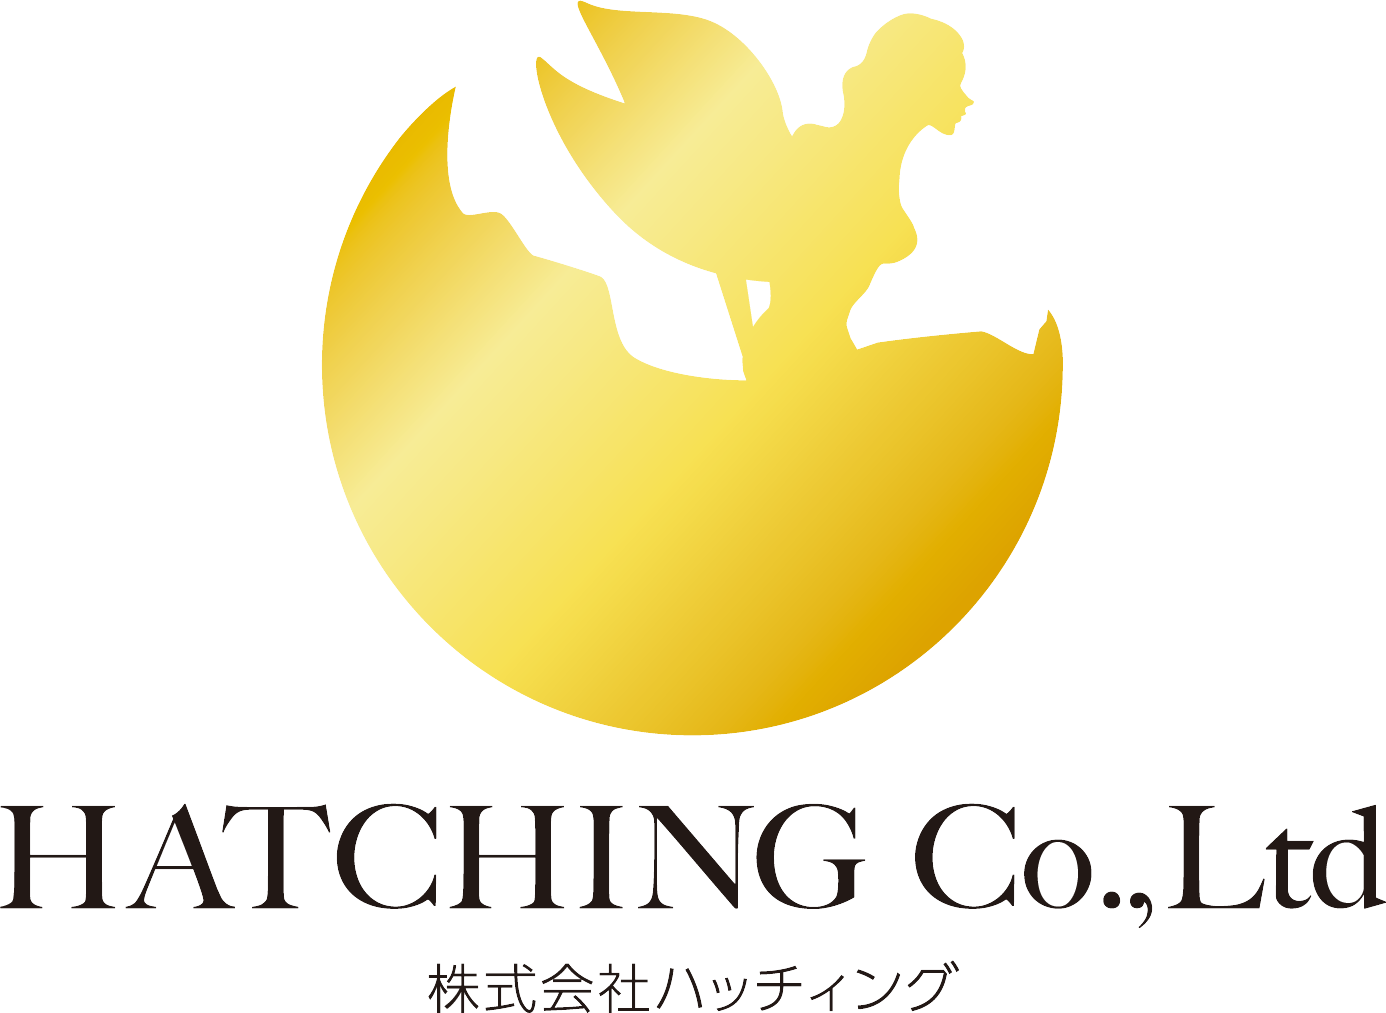 HACHING Co.,Ltd|株式会社ハッチィング